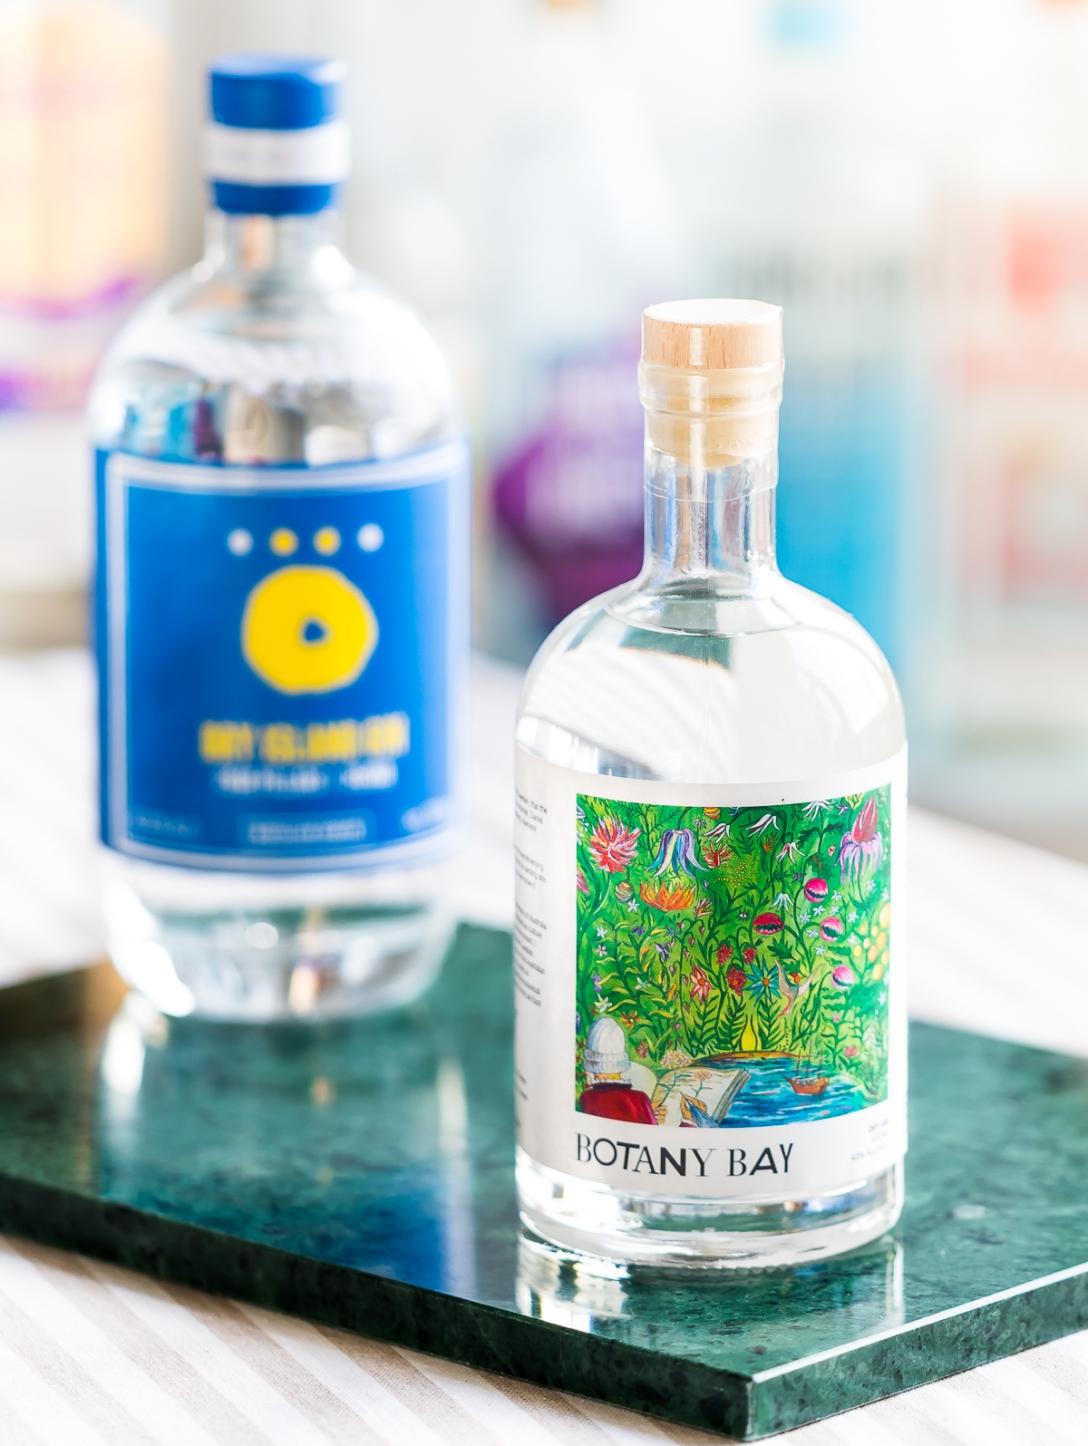 Botany Bay Gin og Dry Island Gin by Hernö Gin x Four Pillars Gin. Photo by Michael Sperling.